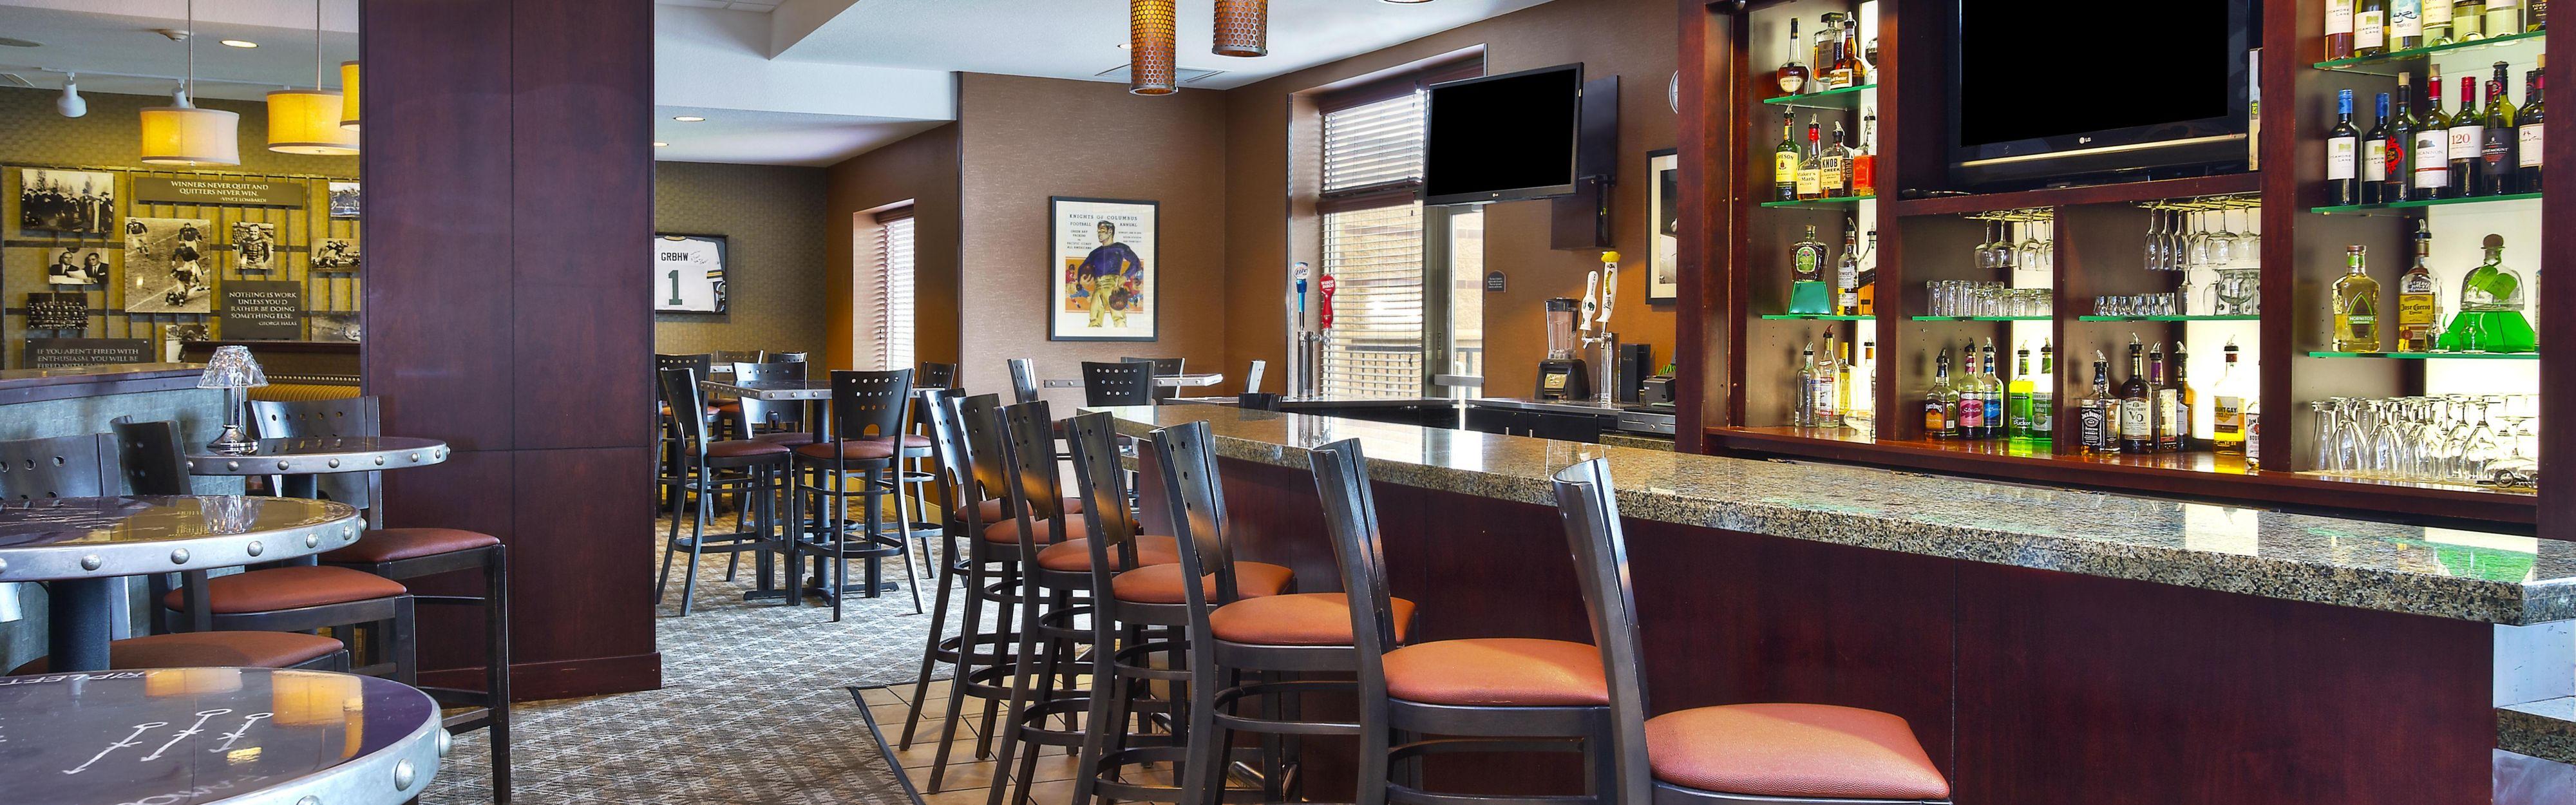 Russ Darrow Green Bay >> Holiday Inn & Suites Green Bay Stadium, Green Bay ...